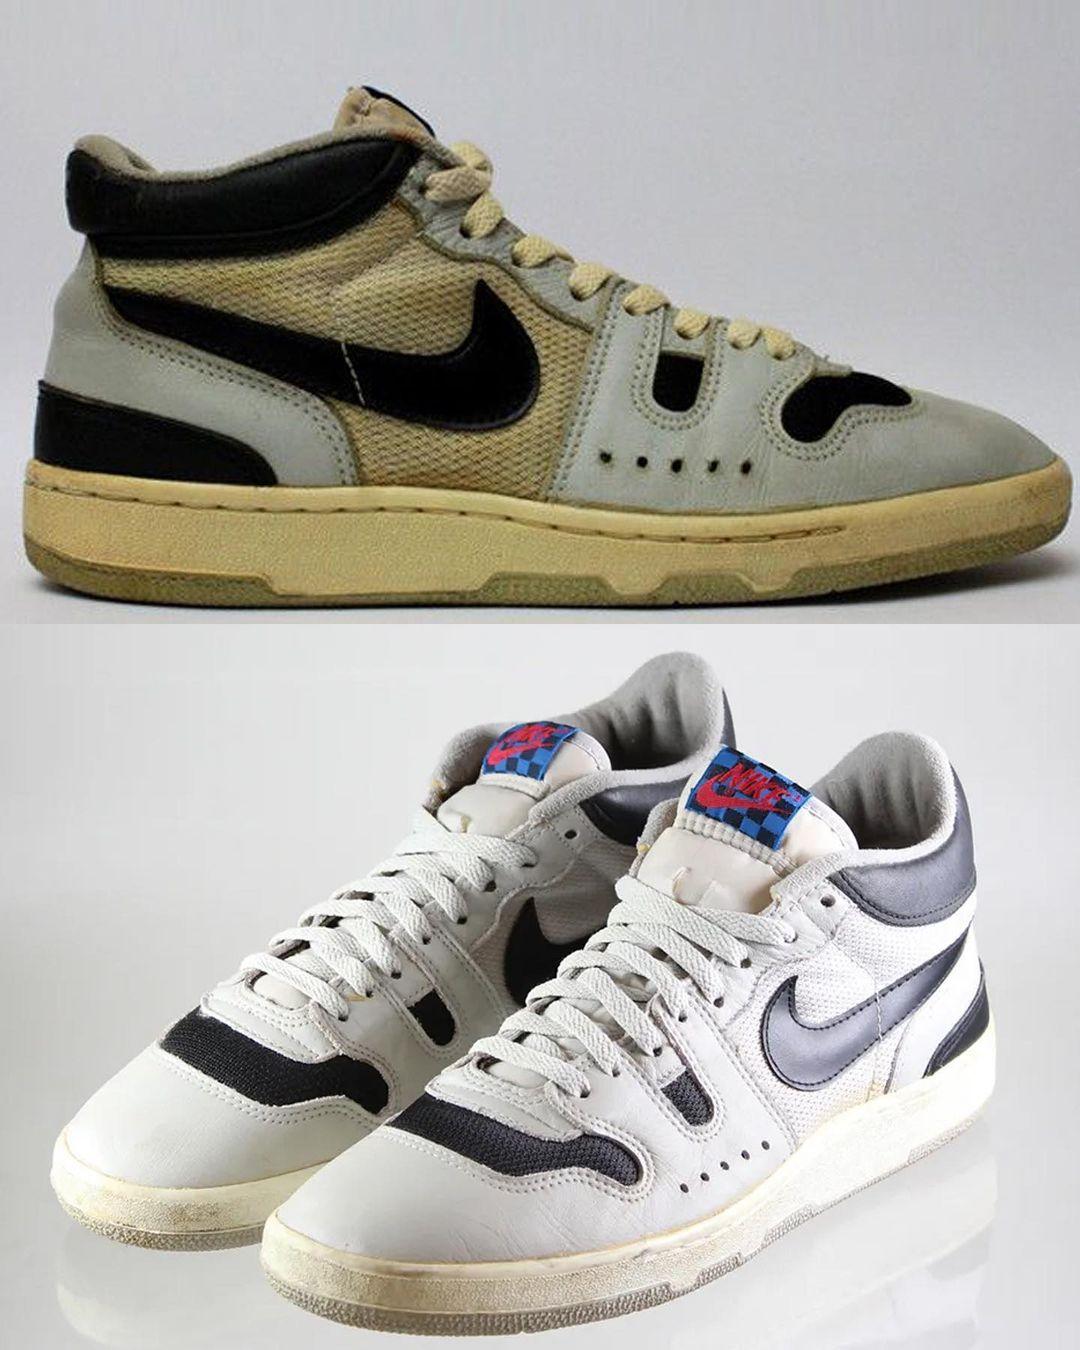 Nike, Mac Attacks,Travis Scott  Vibe 风十足!Travis Scott 上脚神秘 Nike 新鞋曝光!